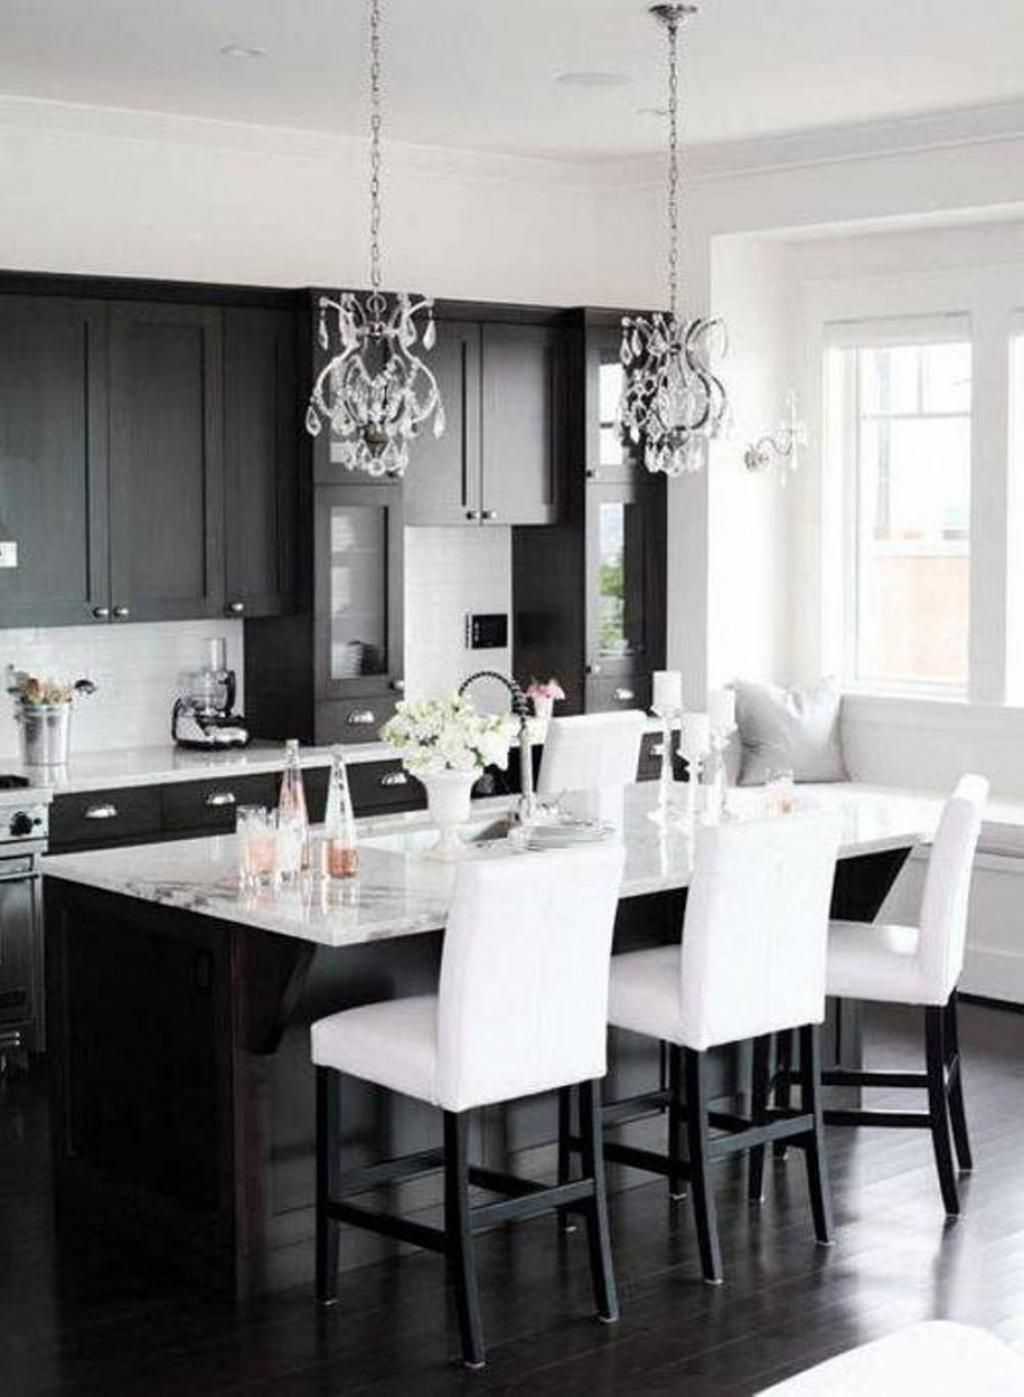 Cool Black and White Apartment Interior Design White